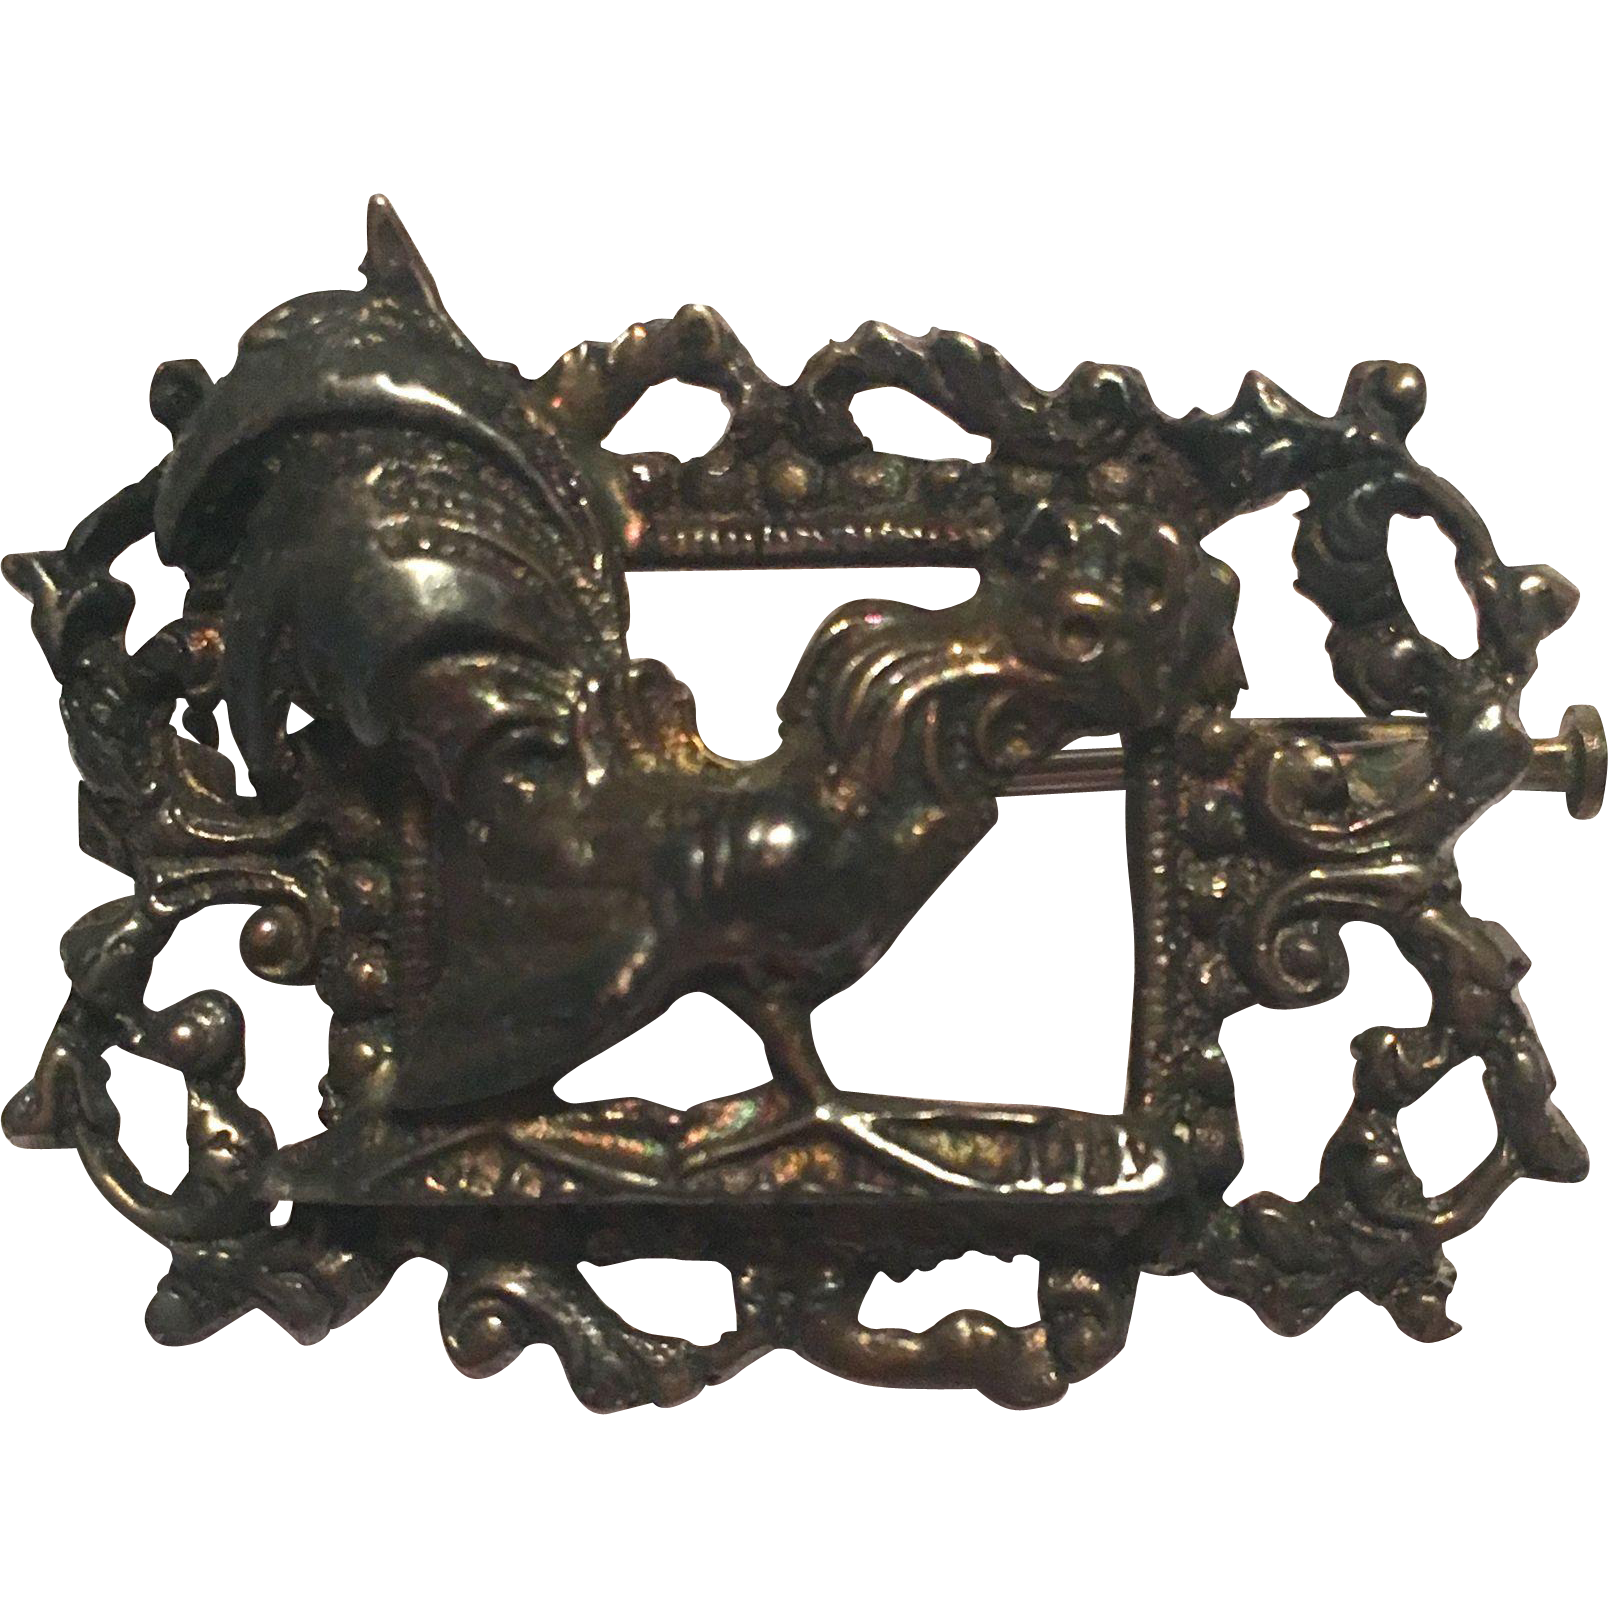 Vintage unusual silver rooster novelty brooch